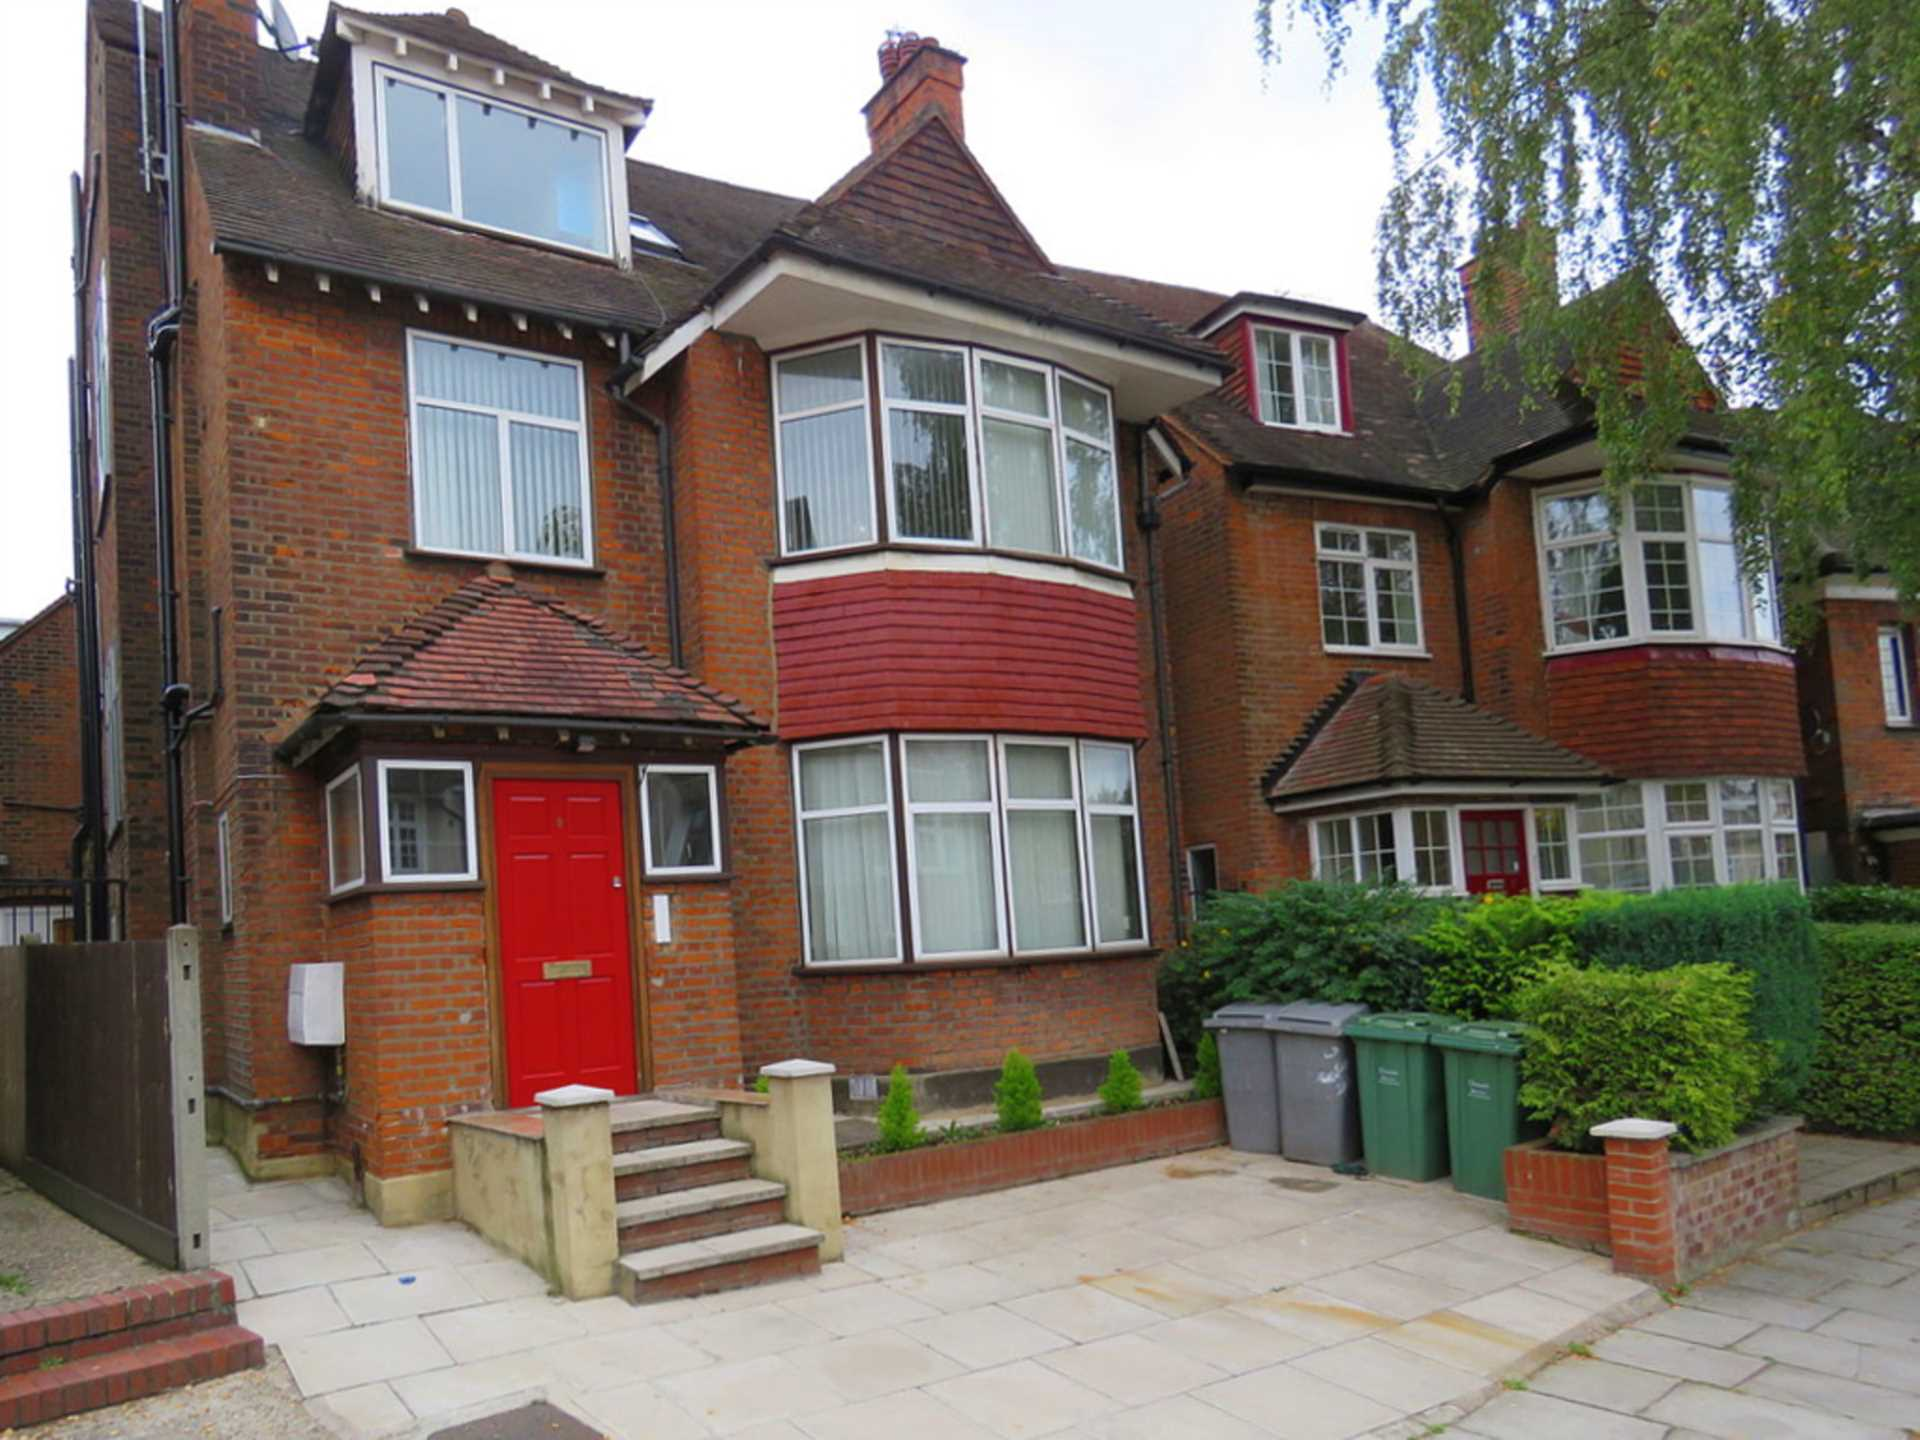 St. Cuthbert Road, Kilburn, Image 6